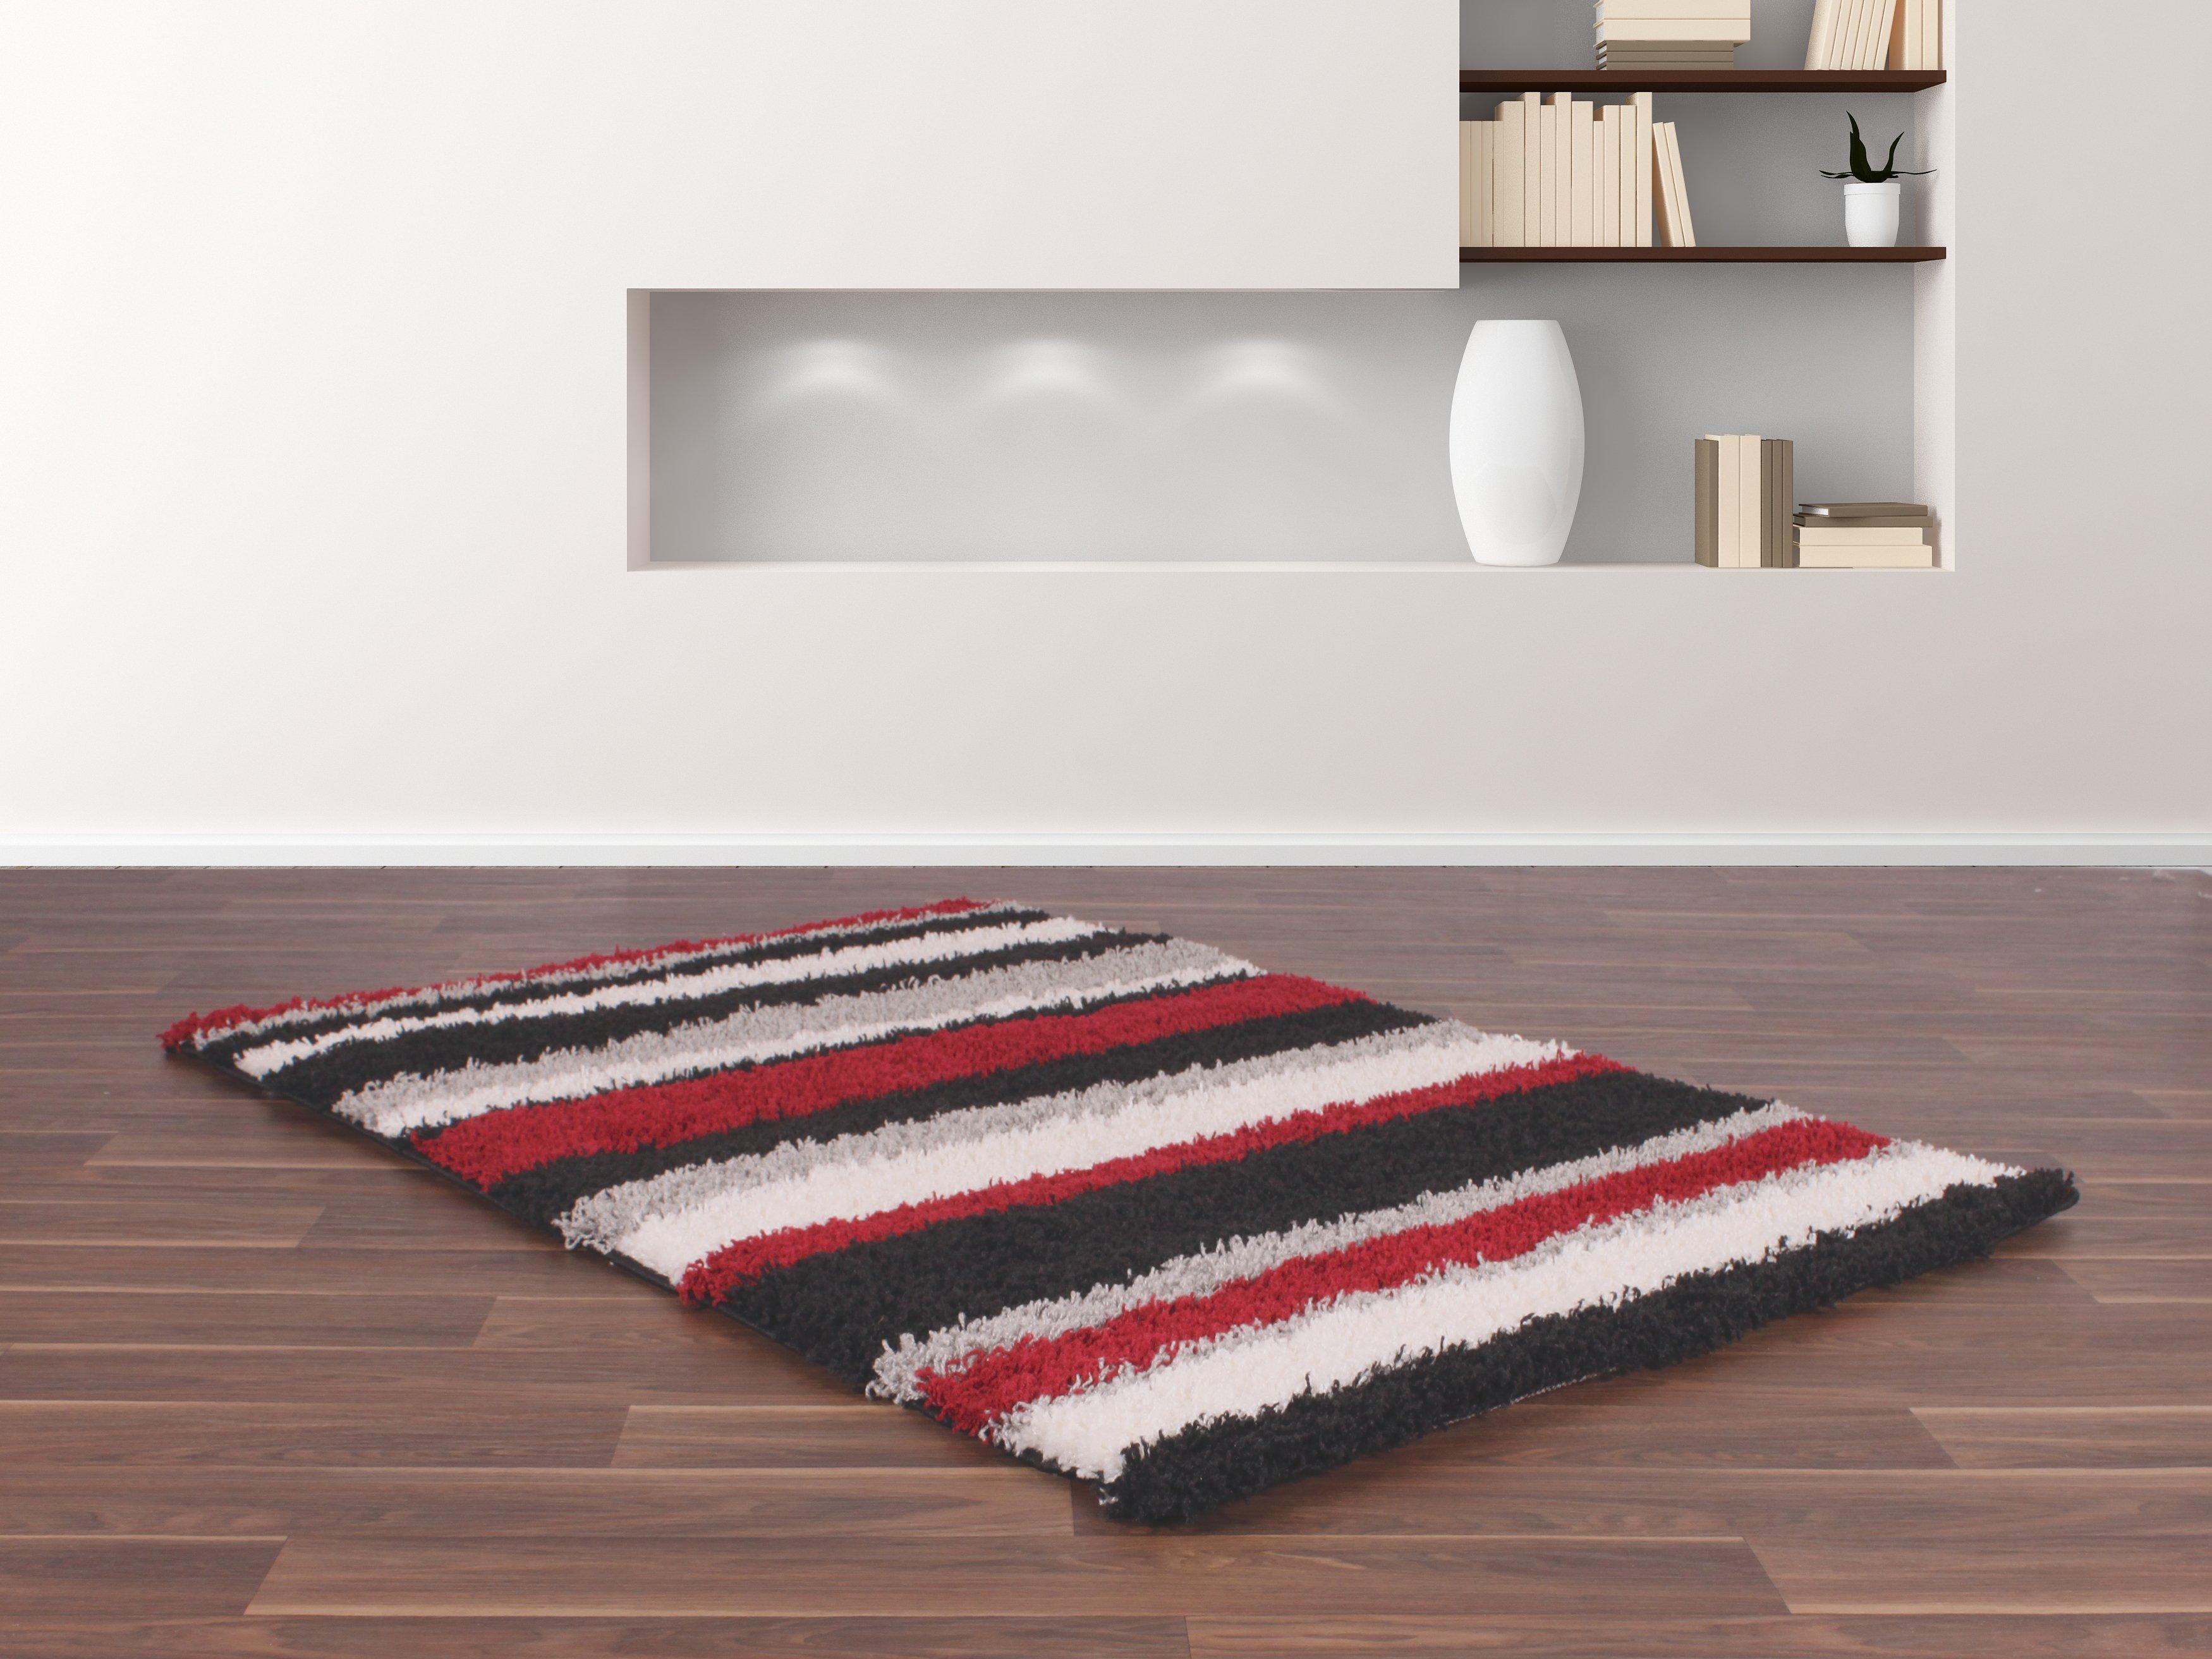 Sienna Stripe Rug - 80 x 150cm - Black and Red.